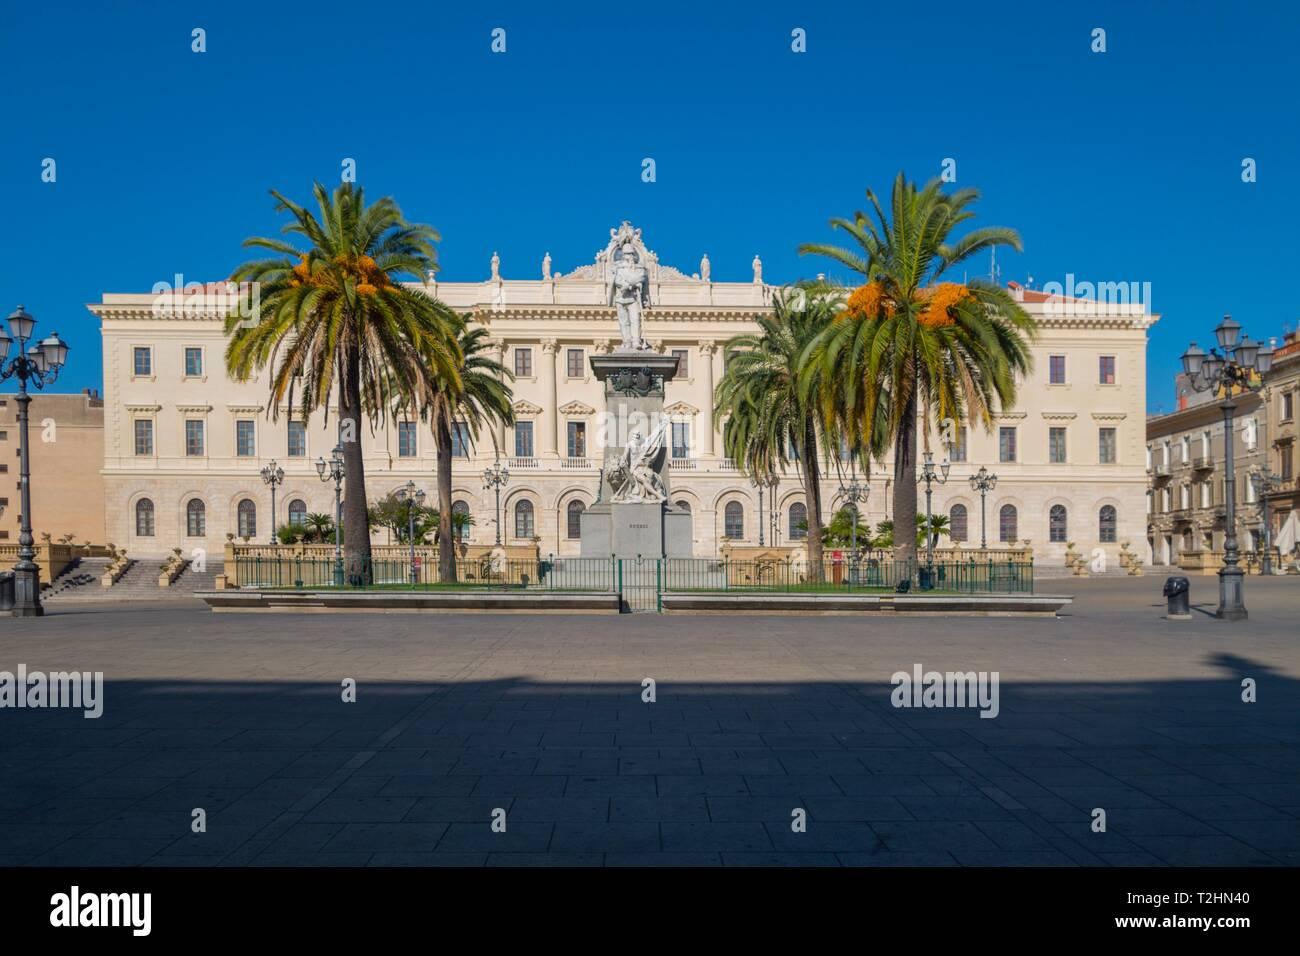 El Palazzo della Provincia en la plaza Piazza d'Italia, Sassari, Cerdeña, Italia, Europa Imagen De Stock